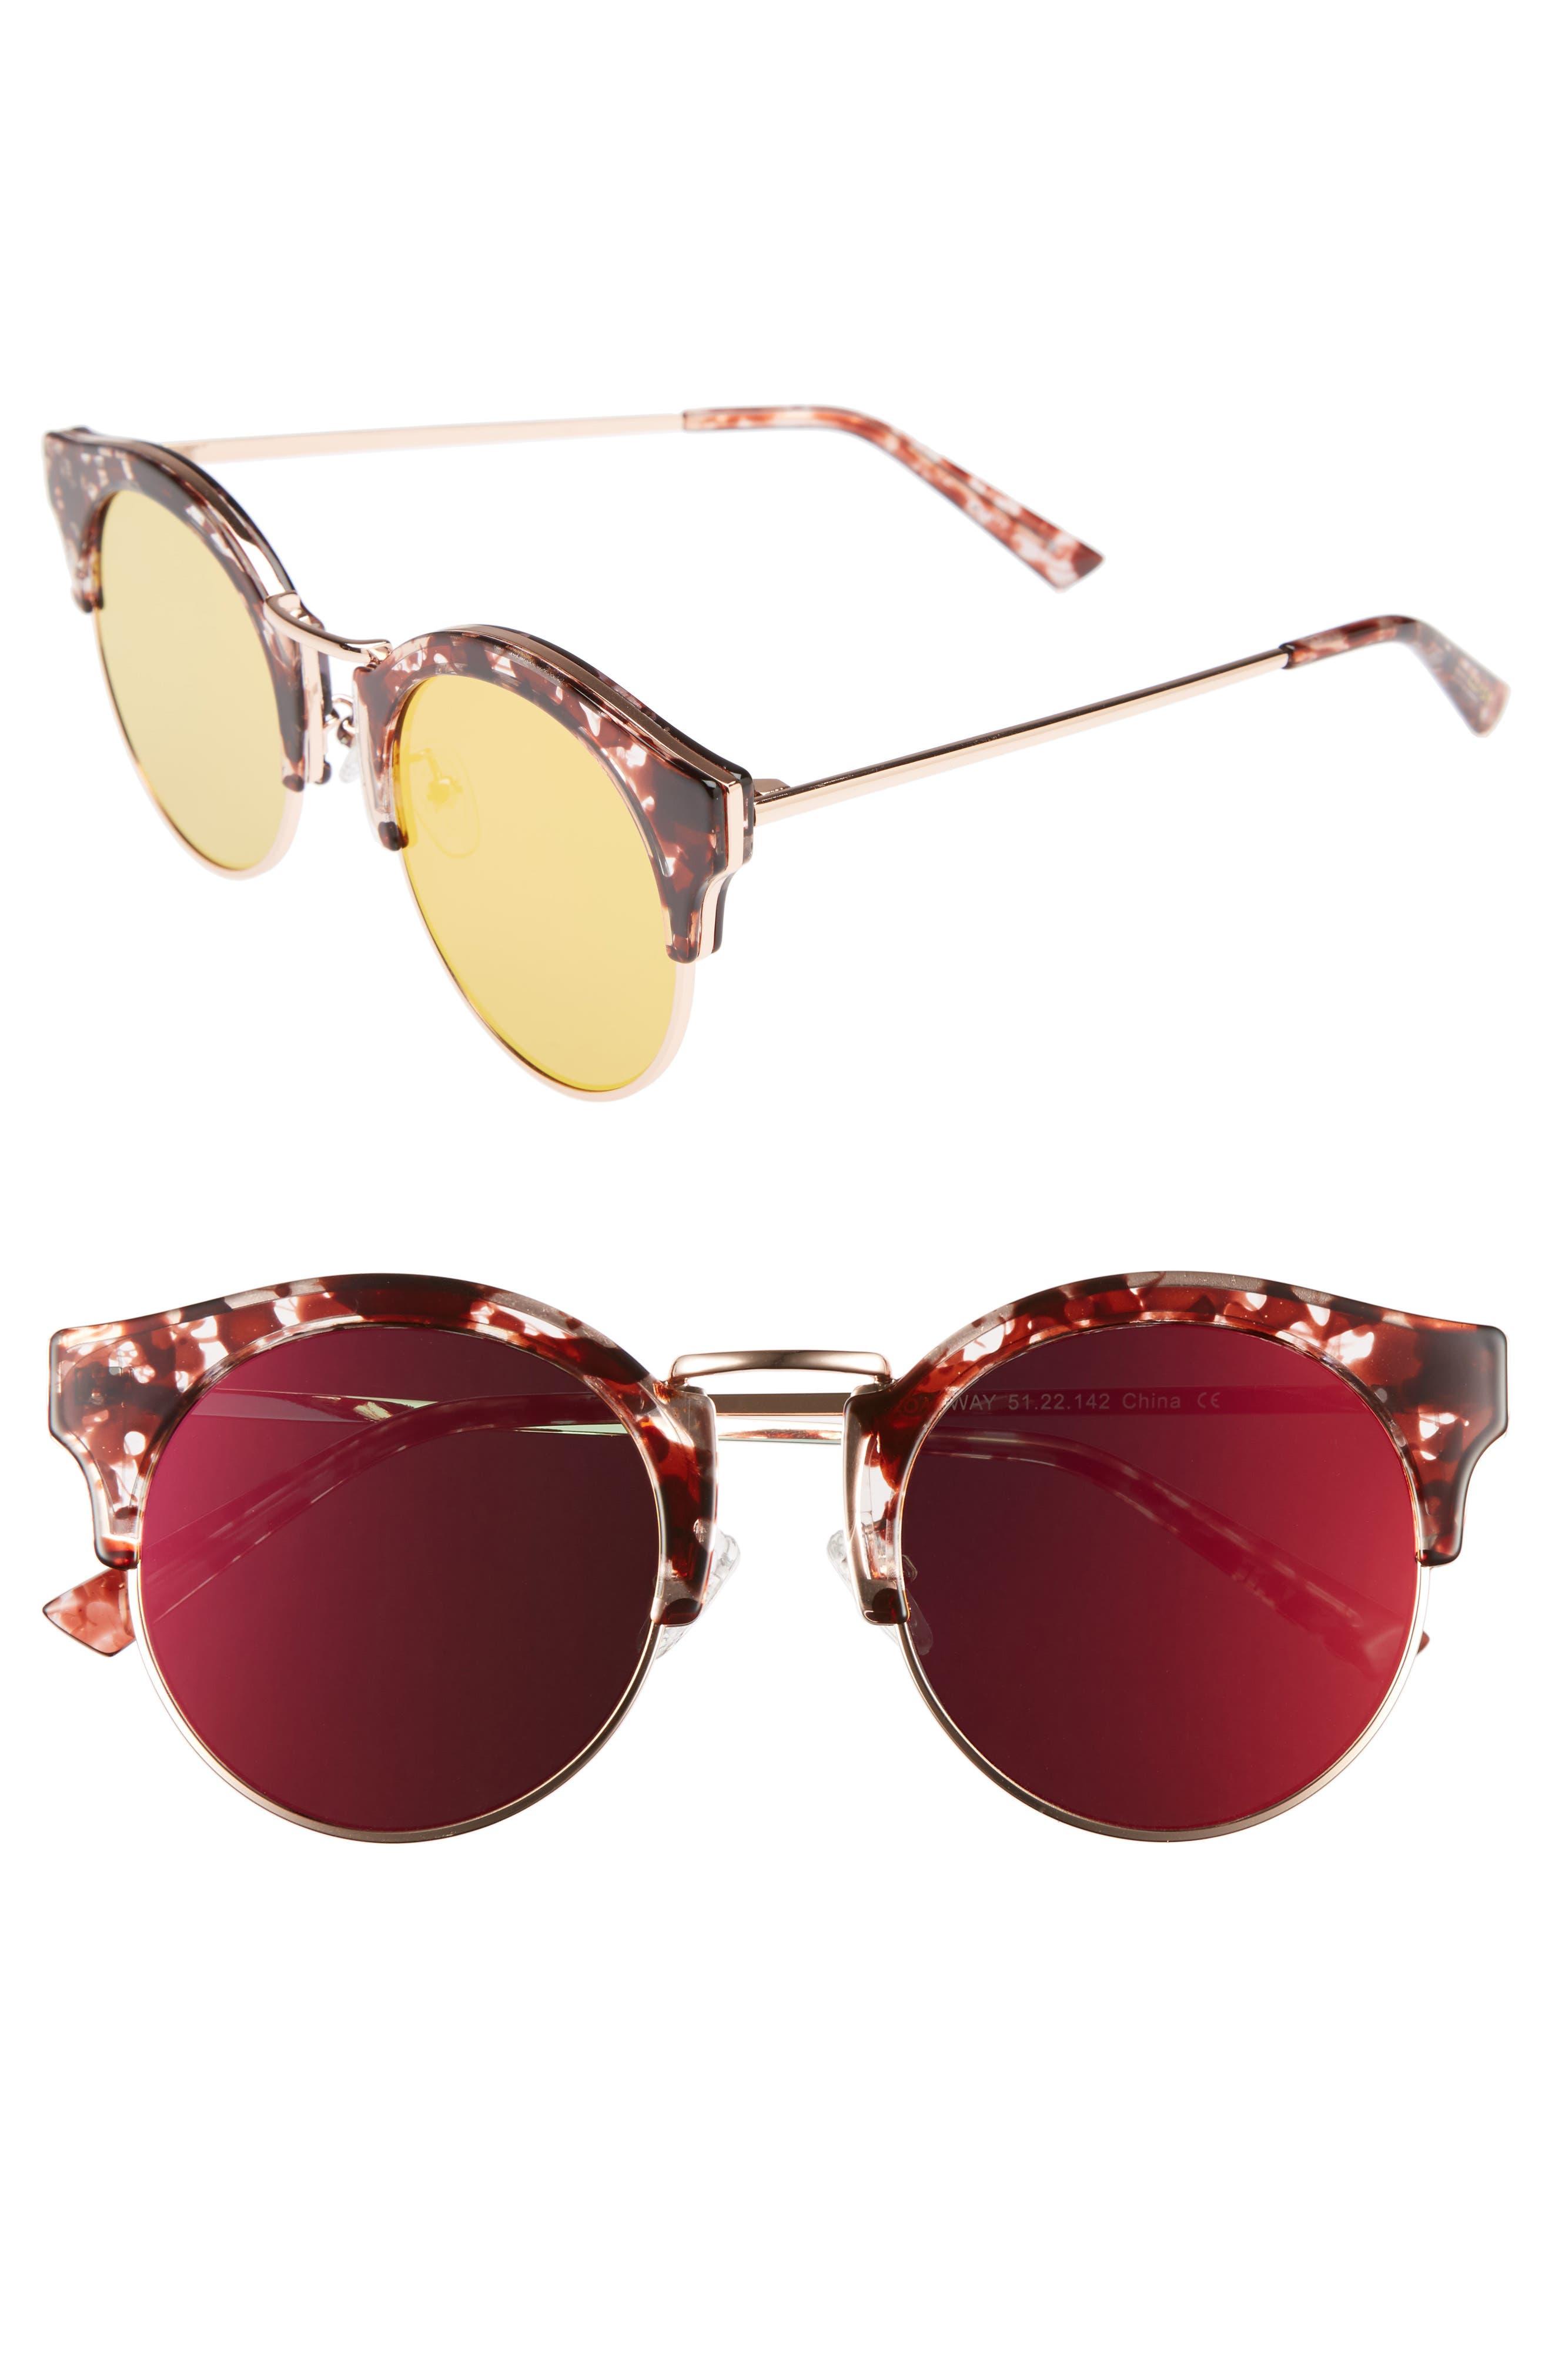 Broadway 51mm Retro Sunglasses,                             Main thumbnail 1, color,                             Lovesick Red